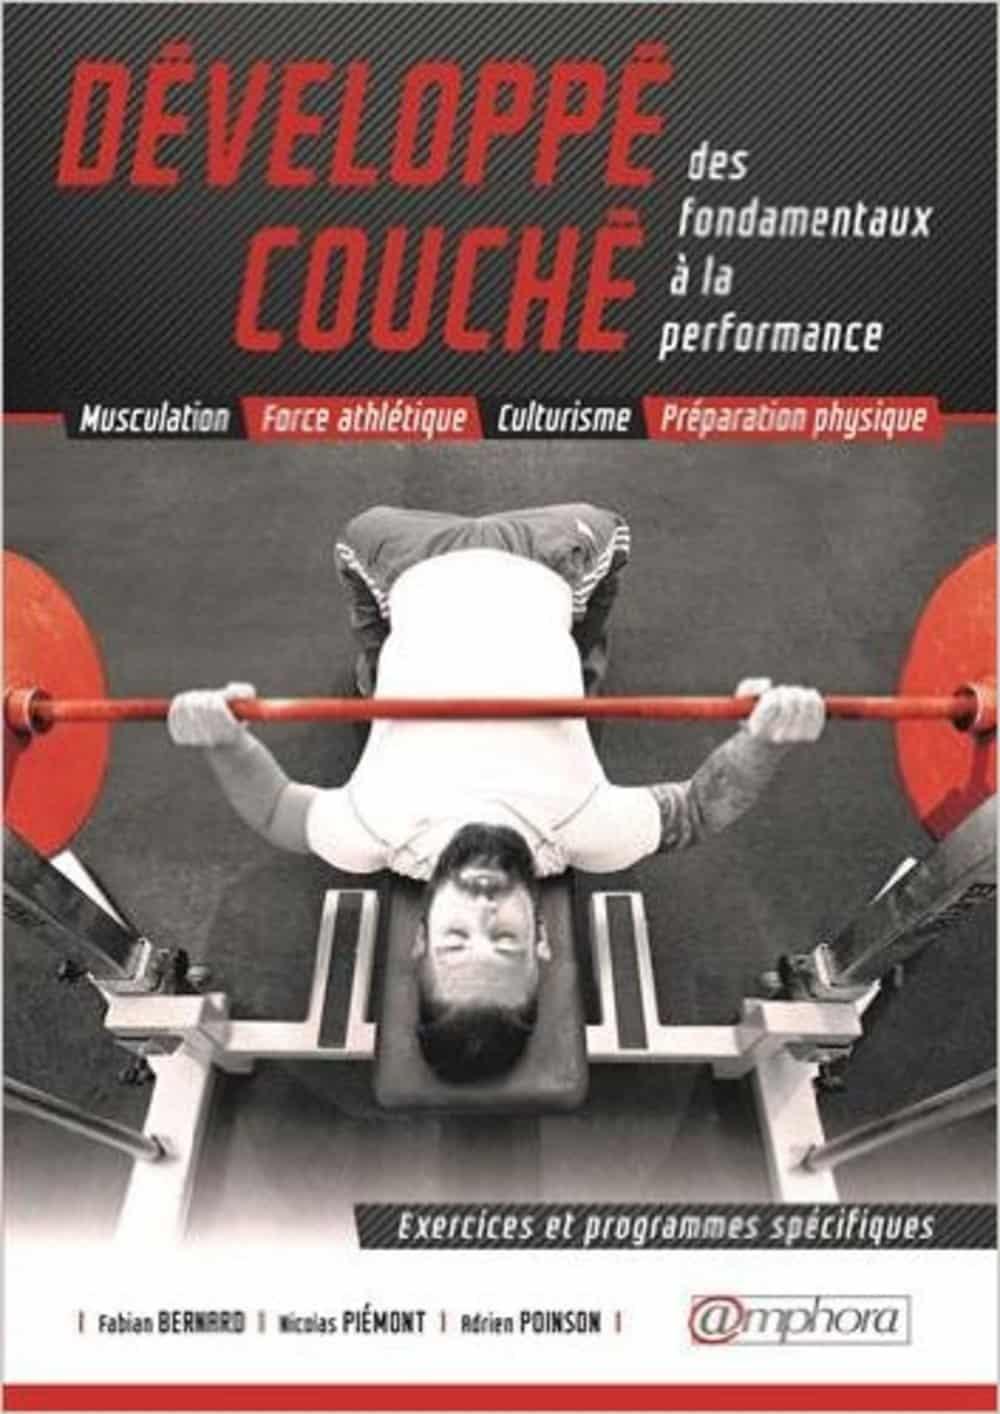 D velopp couch des fondamentaux la performance fitness life - Progresser developpe couche ...